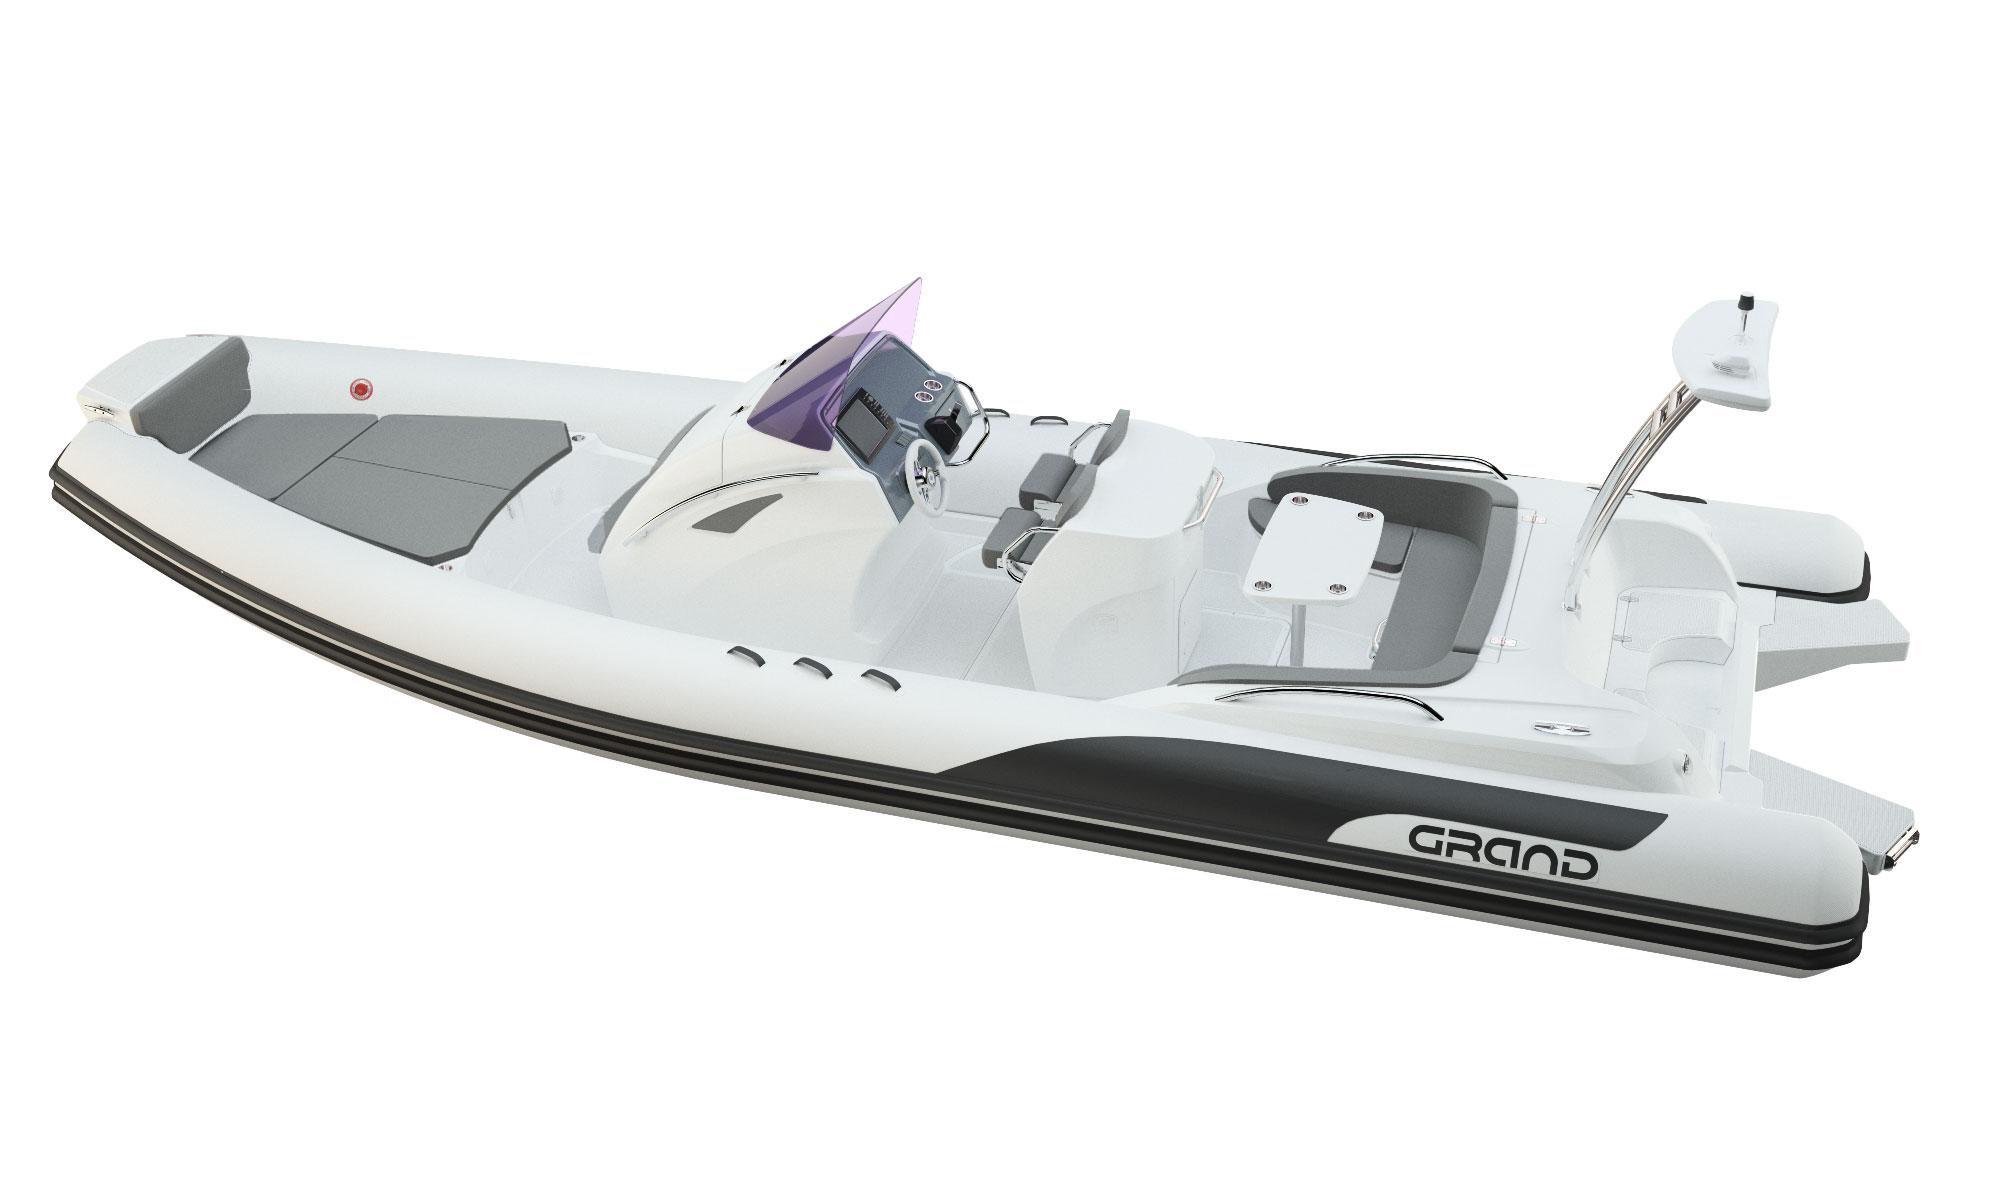 Grand 850 RIB White Edition